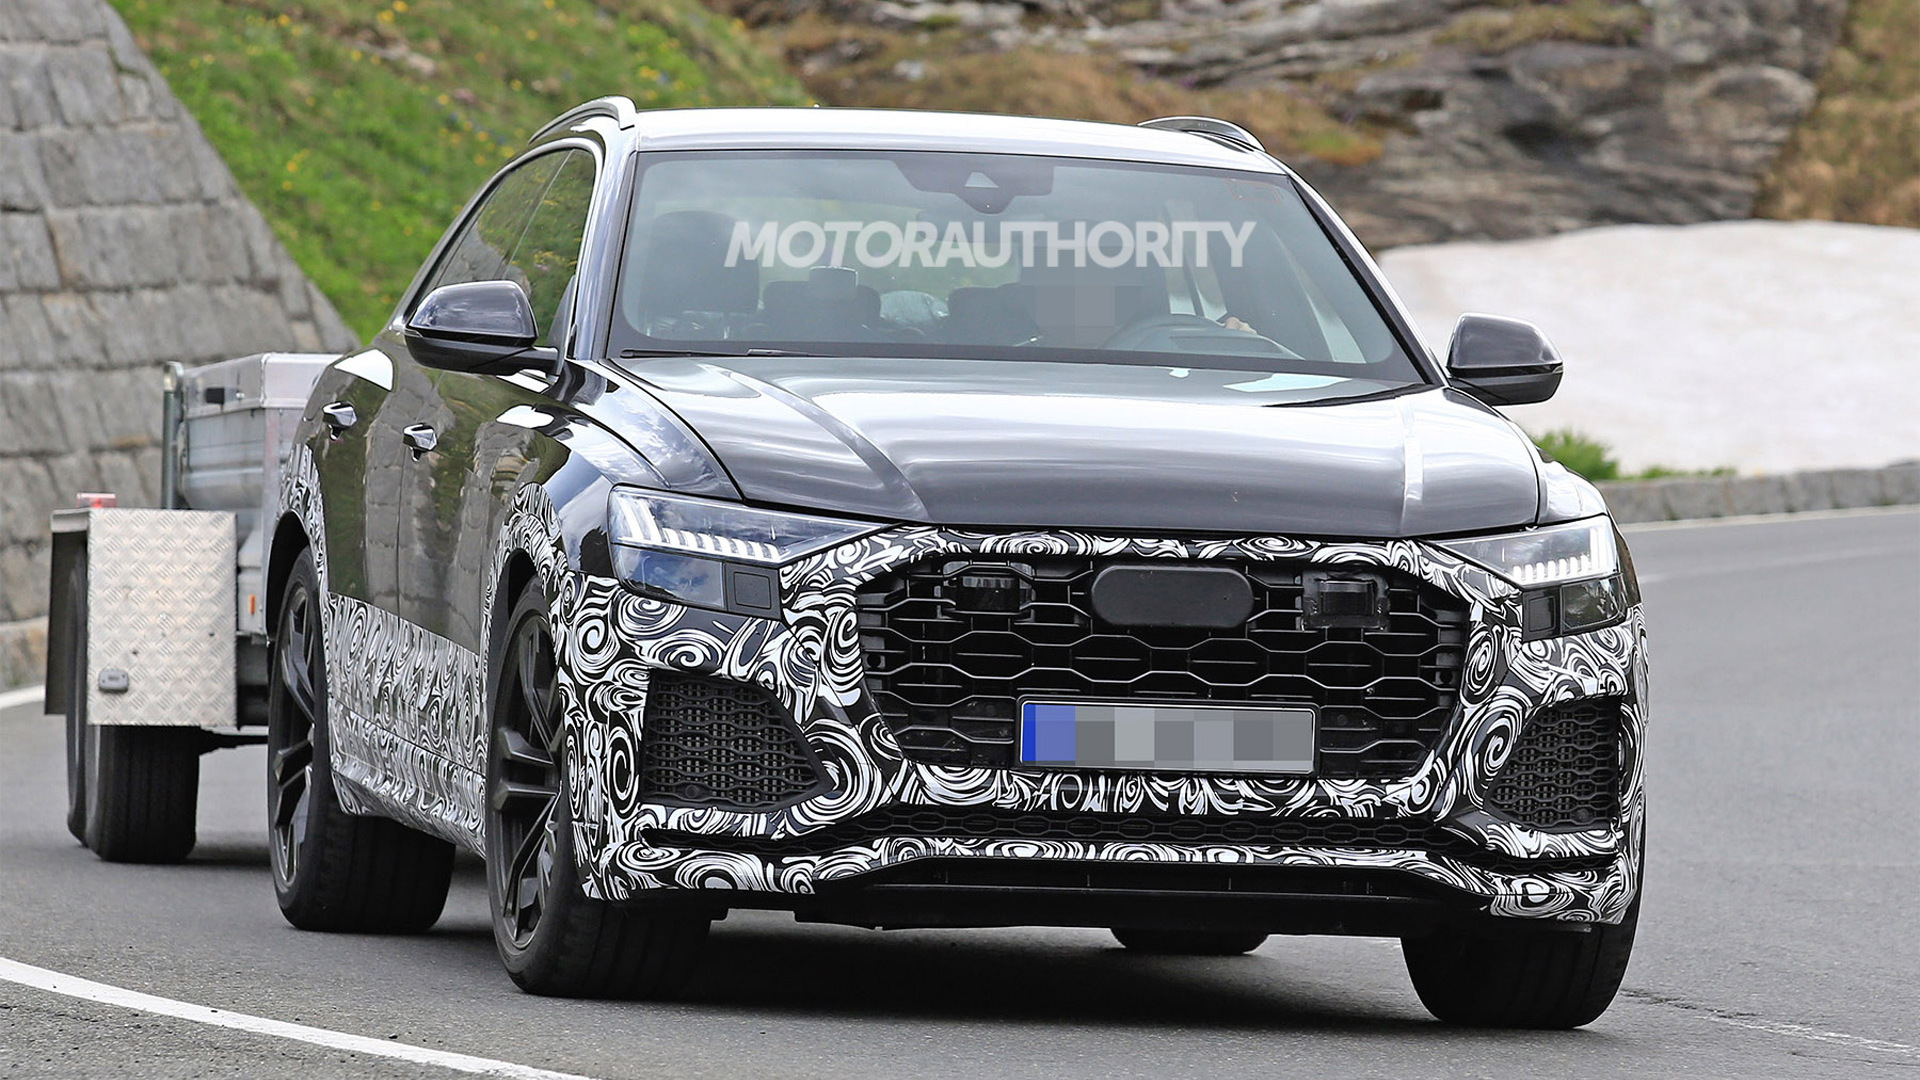 2020 Audi RS Q8 spy shots - Image via S. Baldauf/SB-Medien